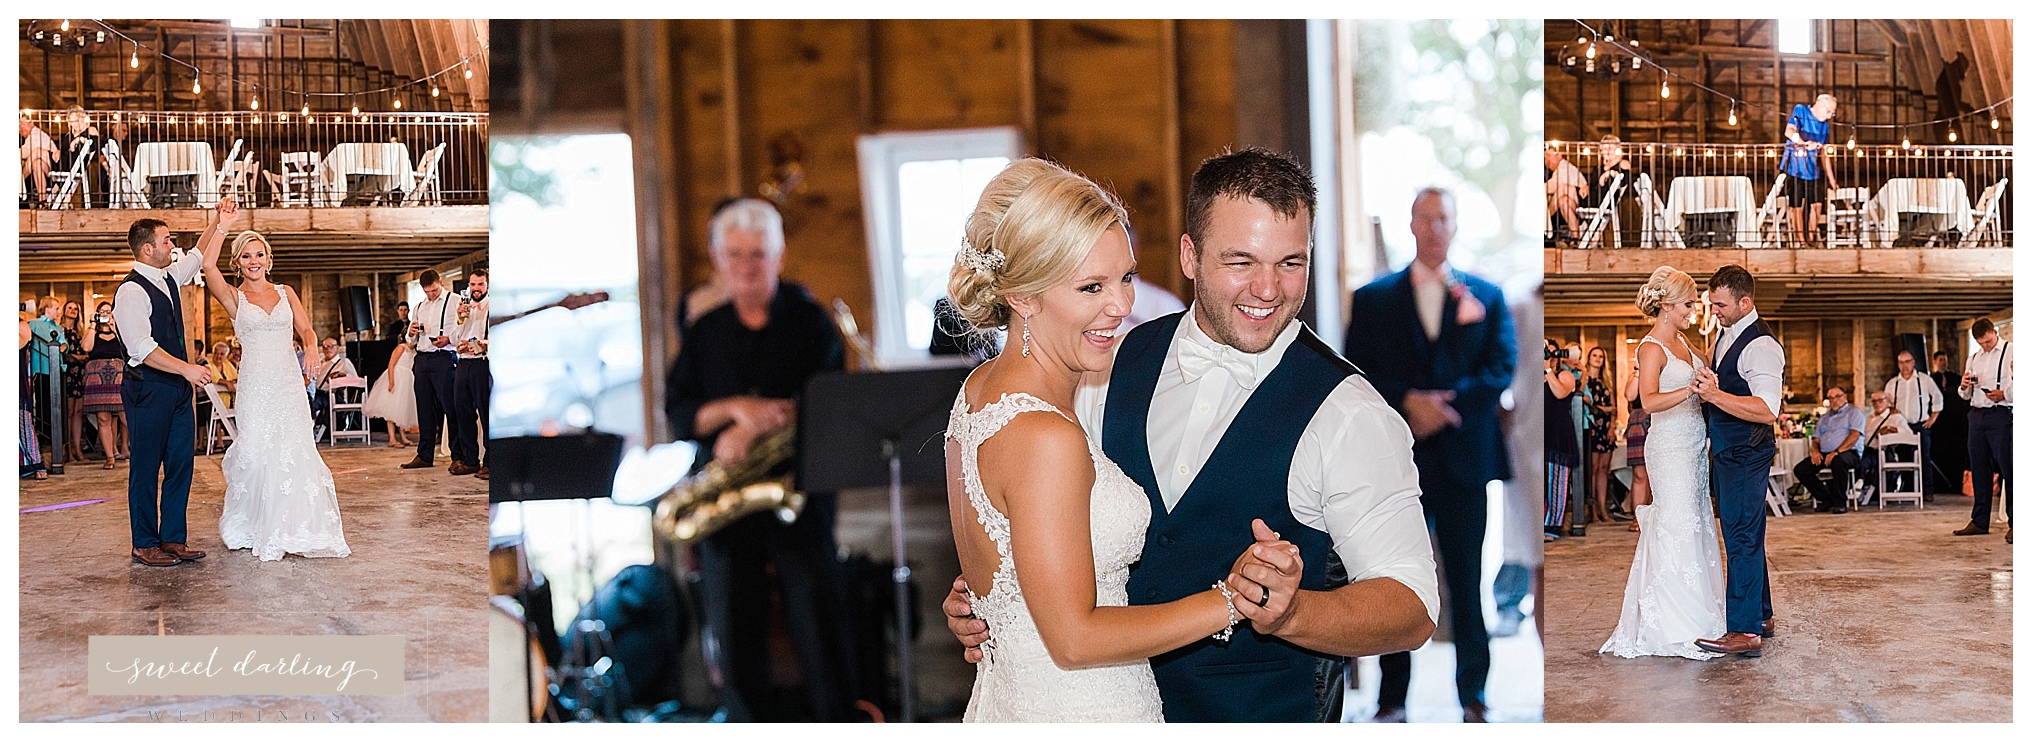 Rpaxton-illinois-engelbrecht-farm-country-wedding-photographer-sweet-darling-weddings_1258.jpg